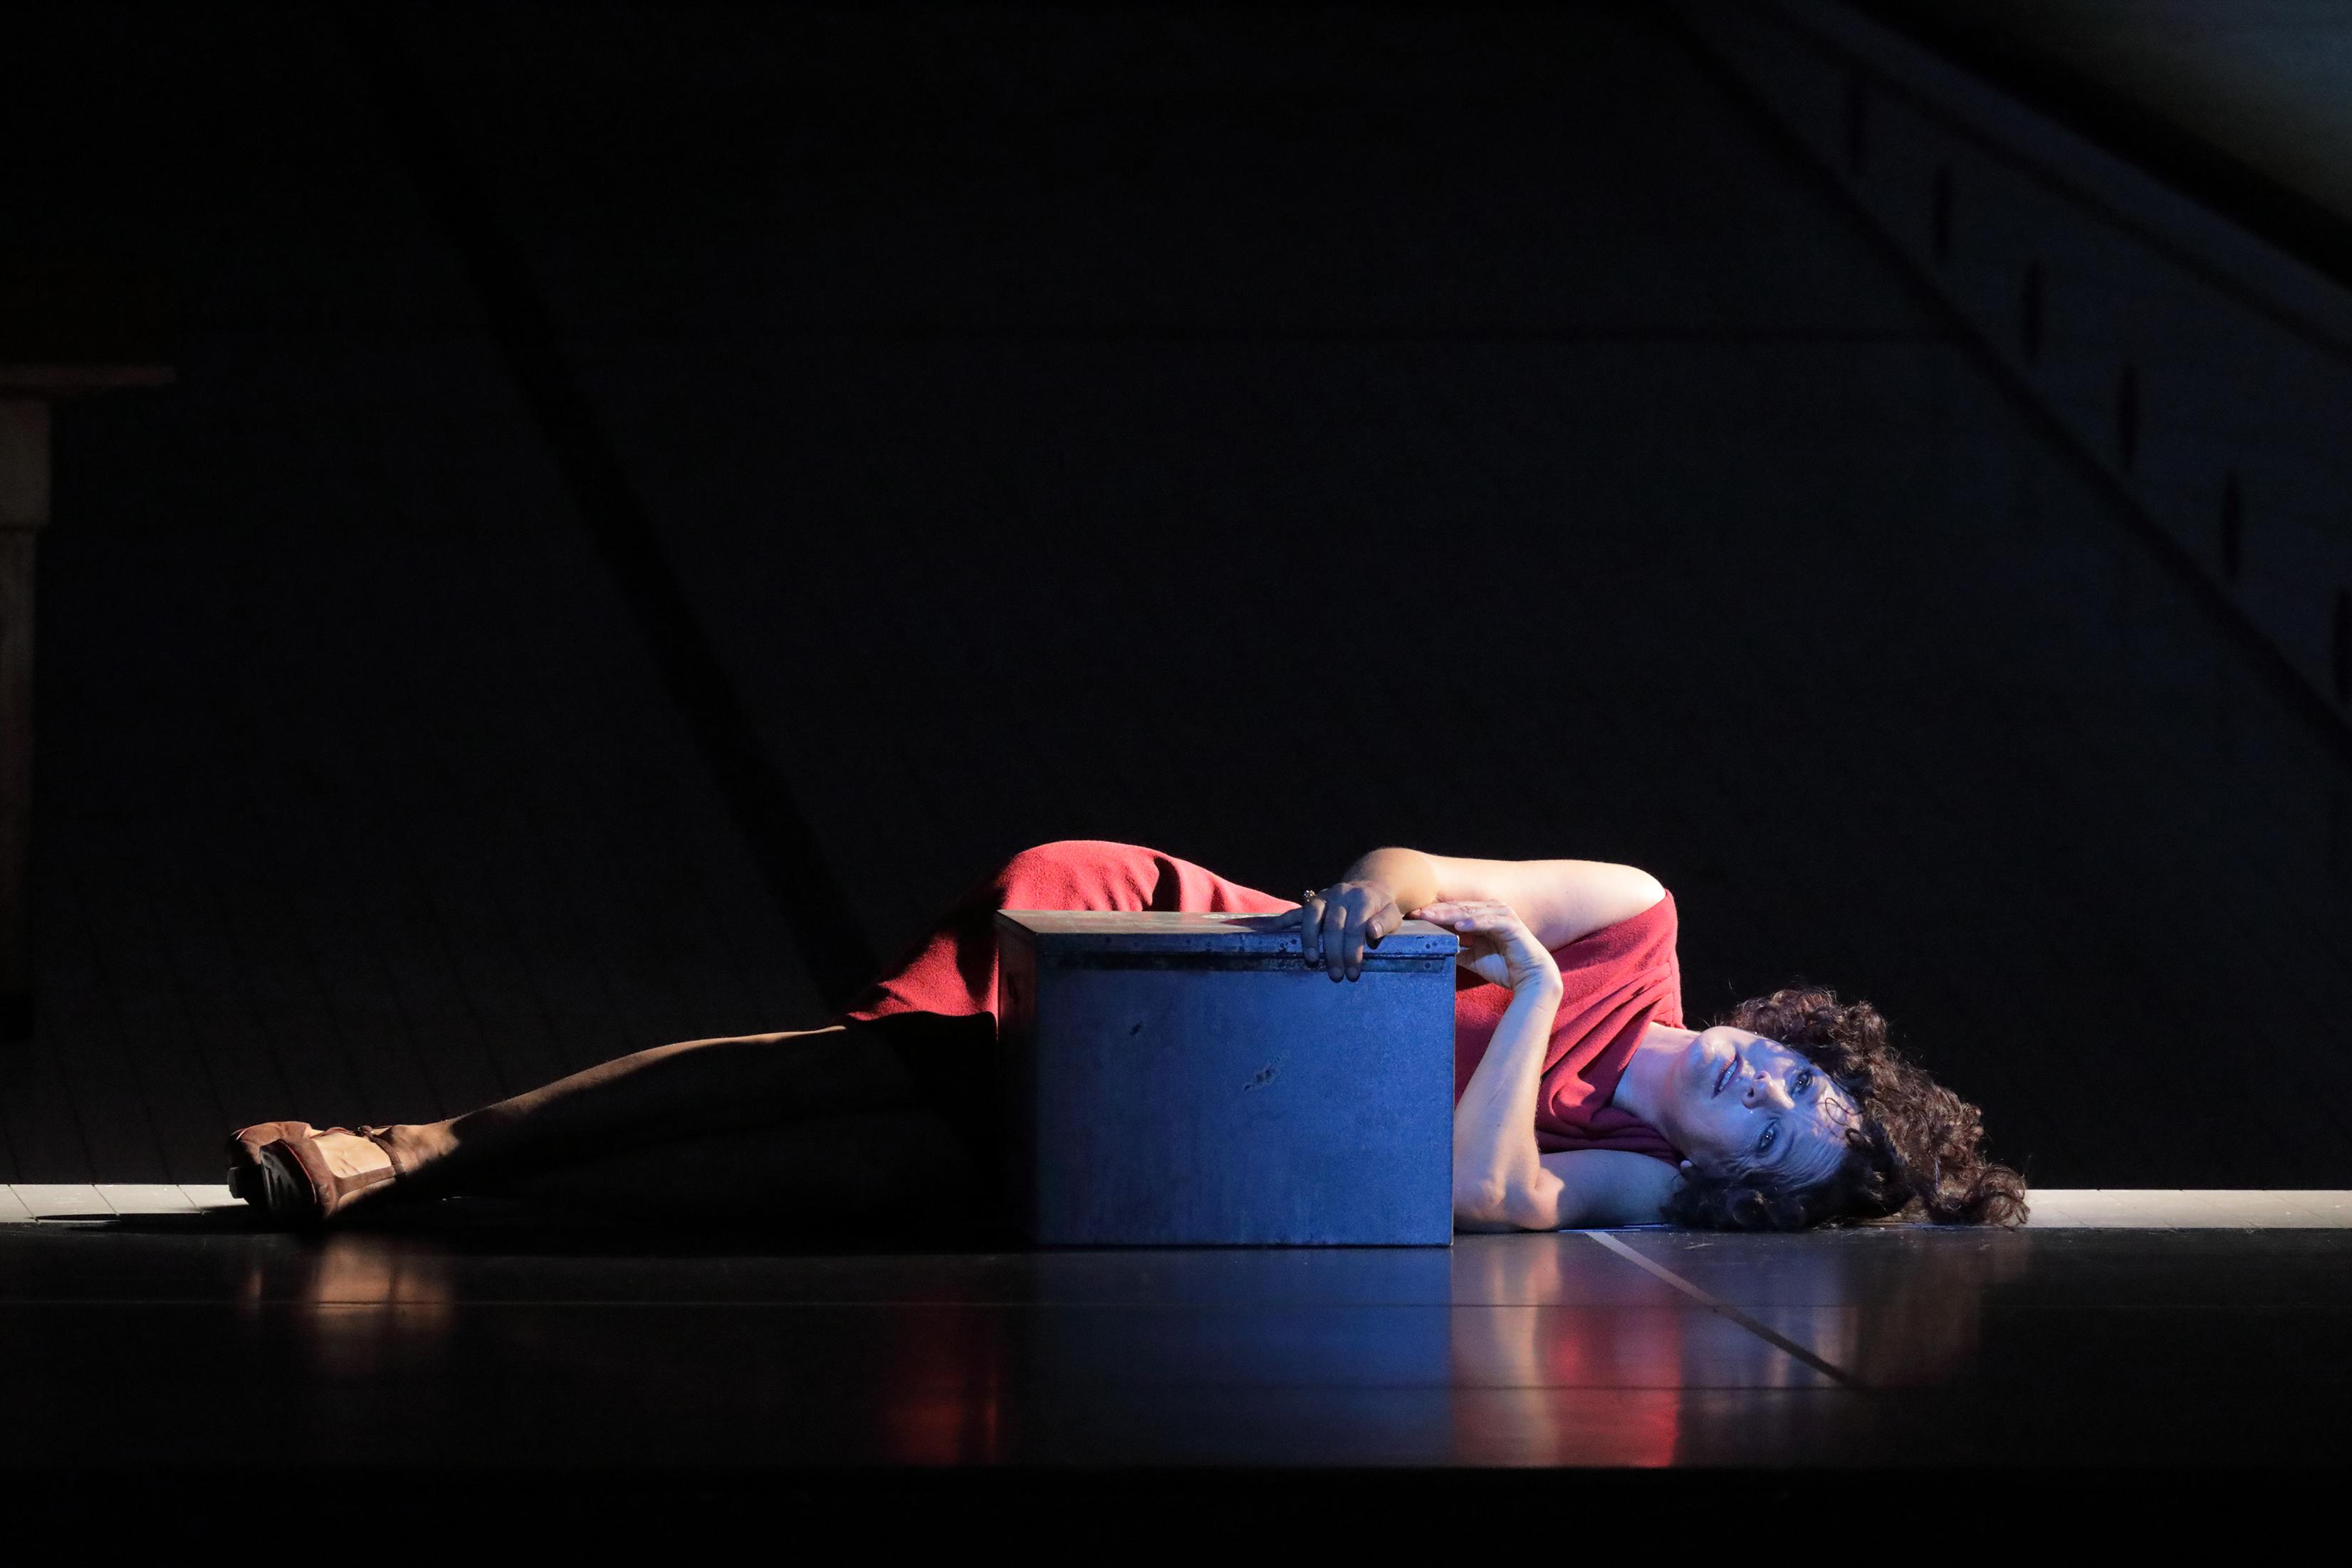 Salome Strauss Marlis Petersen soprano stage performance classical opera Krzysztof Warlikowski